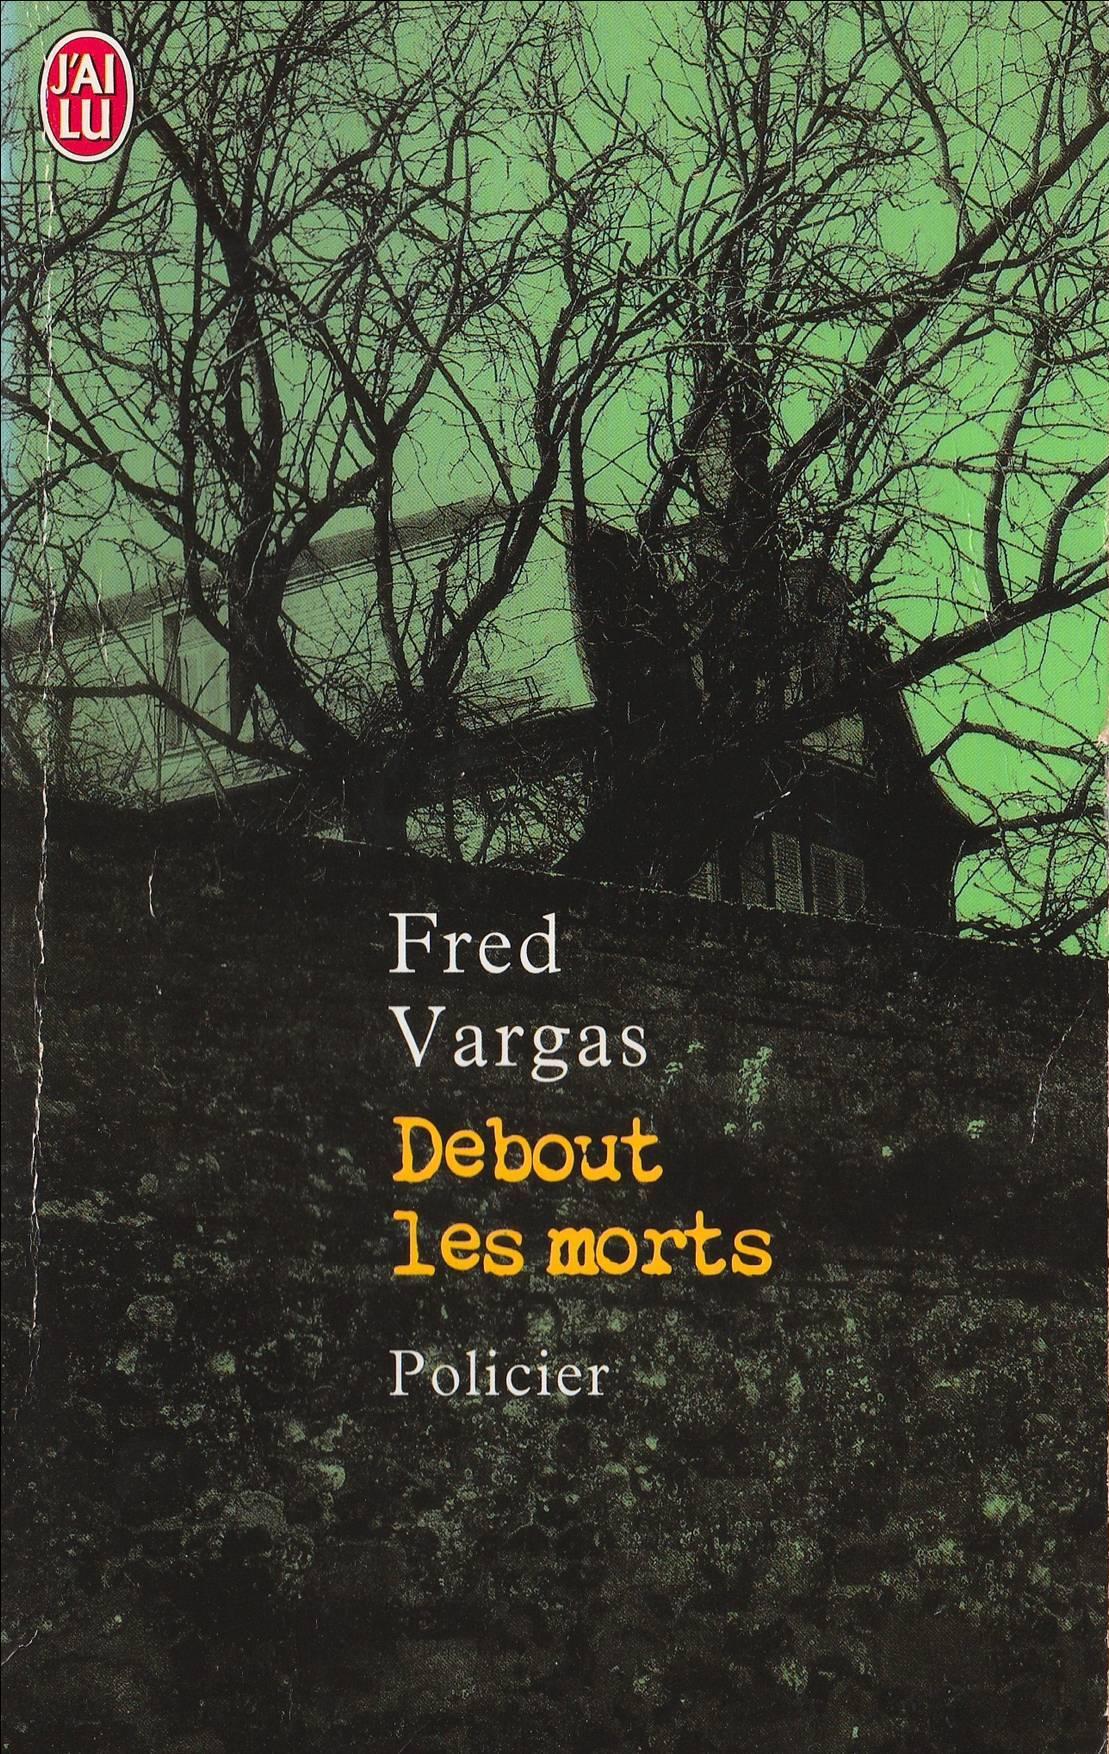 Debout les morts - Fred Vargas.jpg